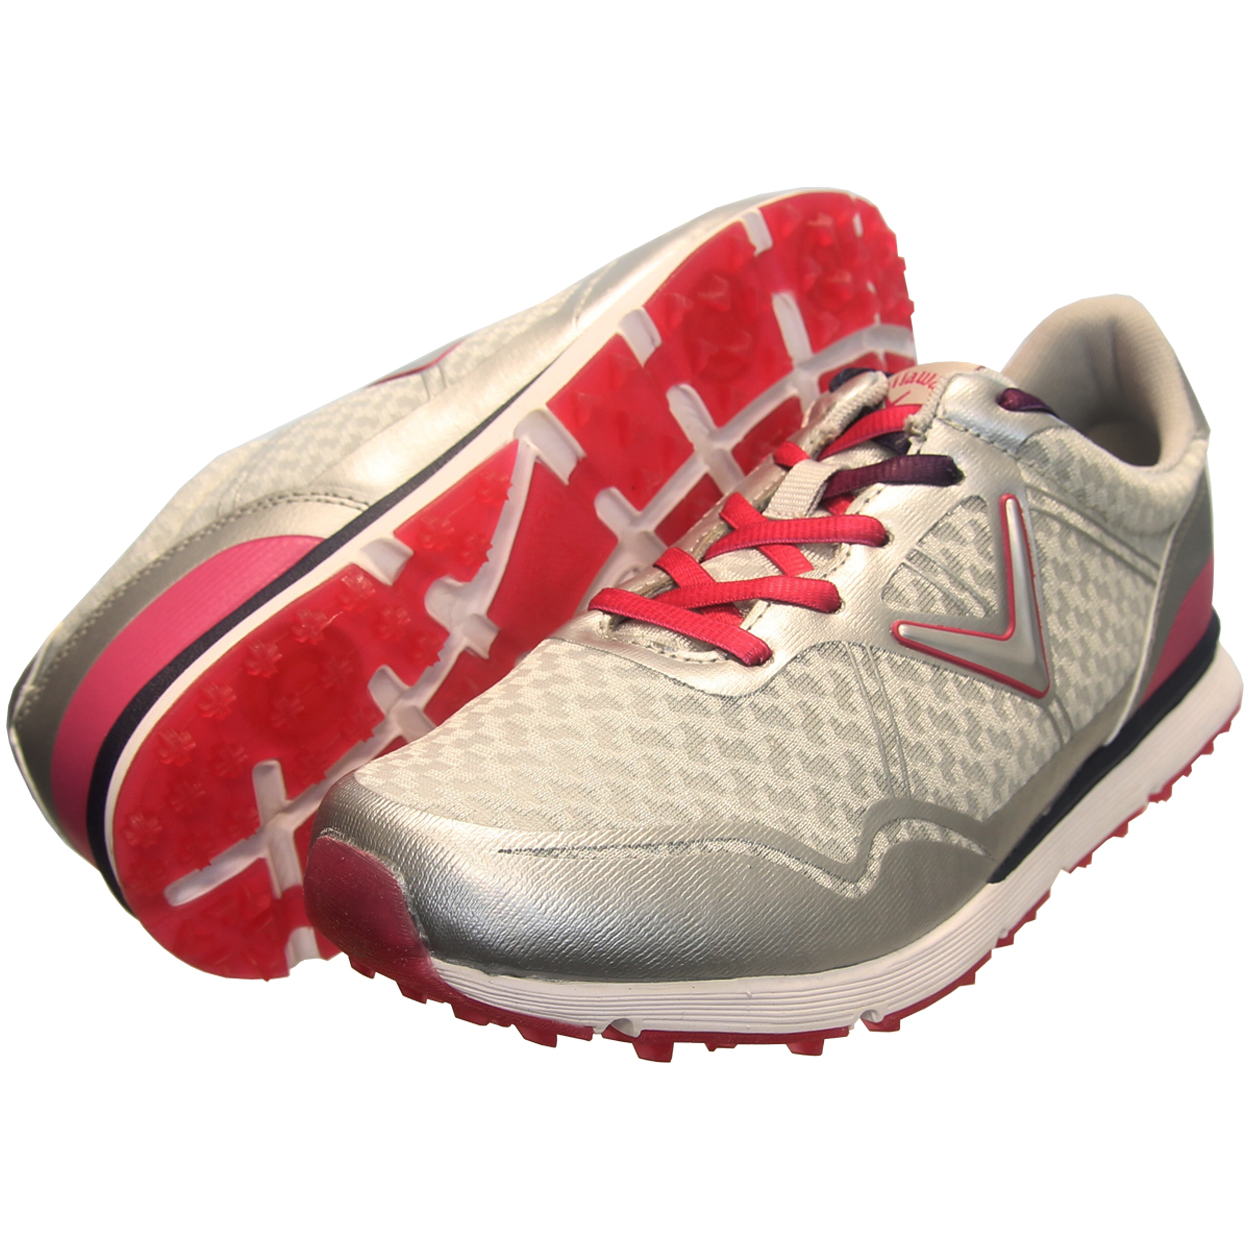 Callaway-Women-039-s-Solaire-Golf-Shoe-New thumbnail 5